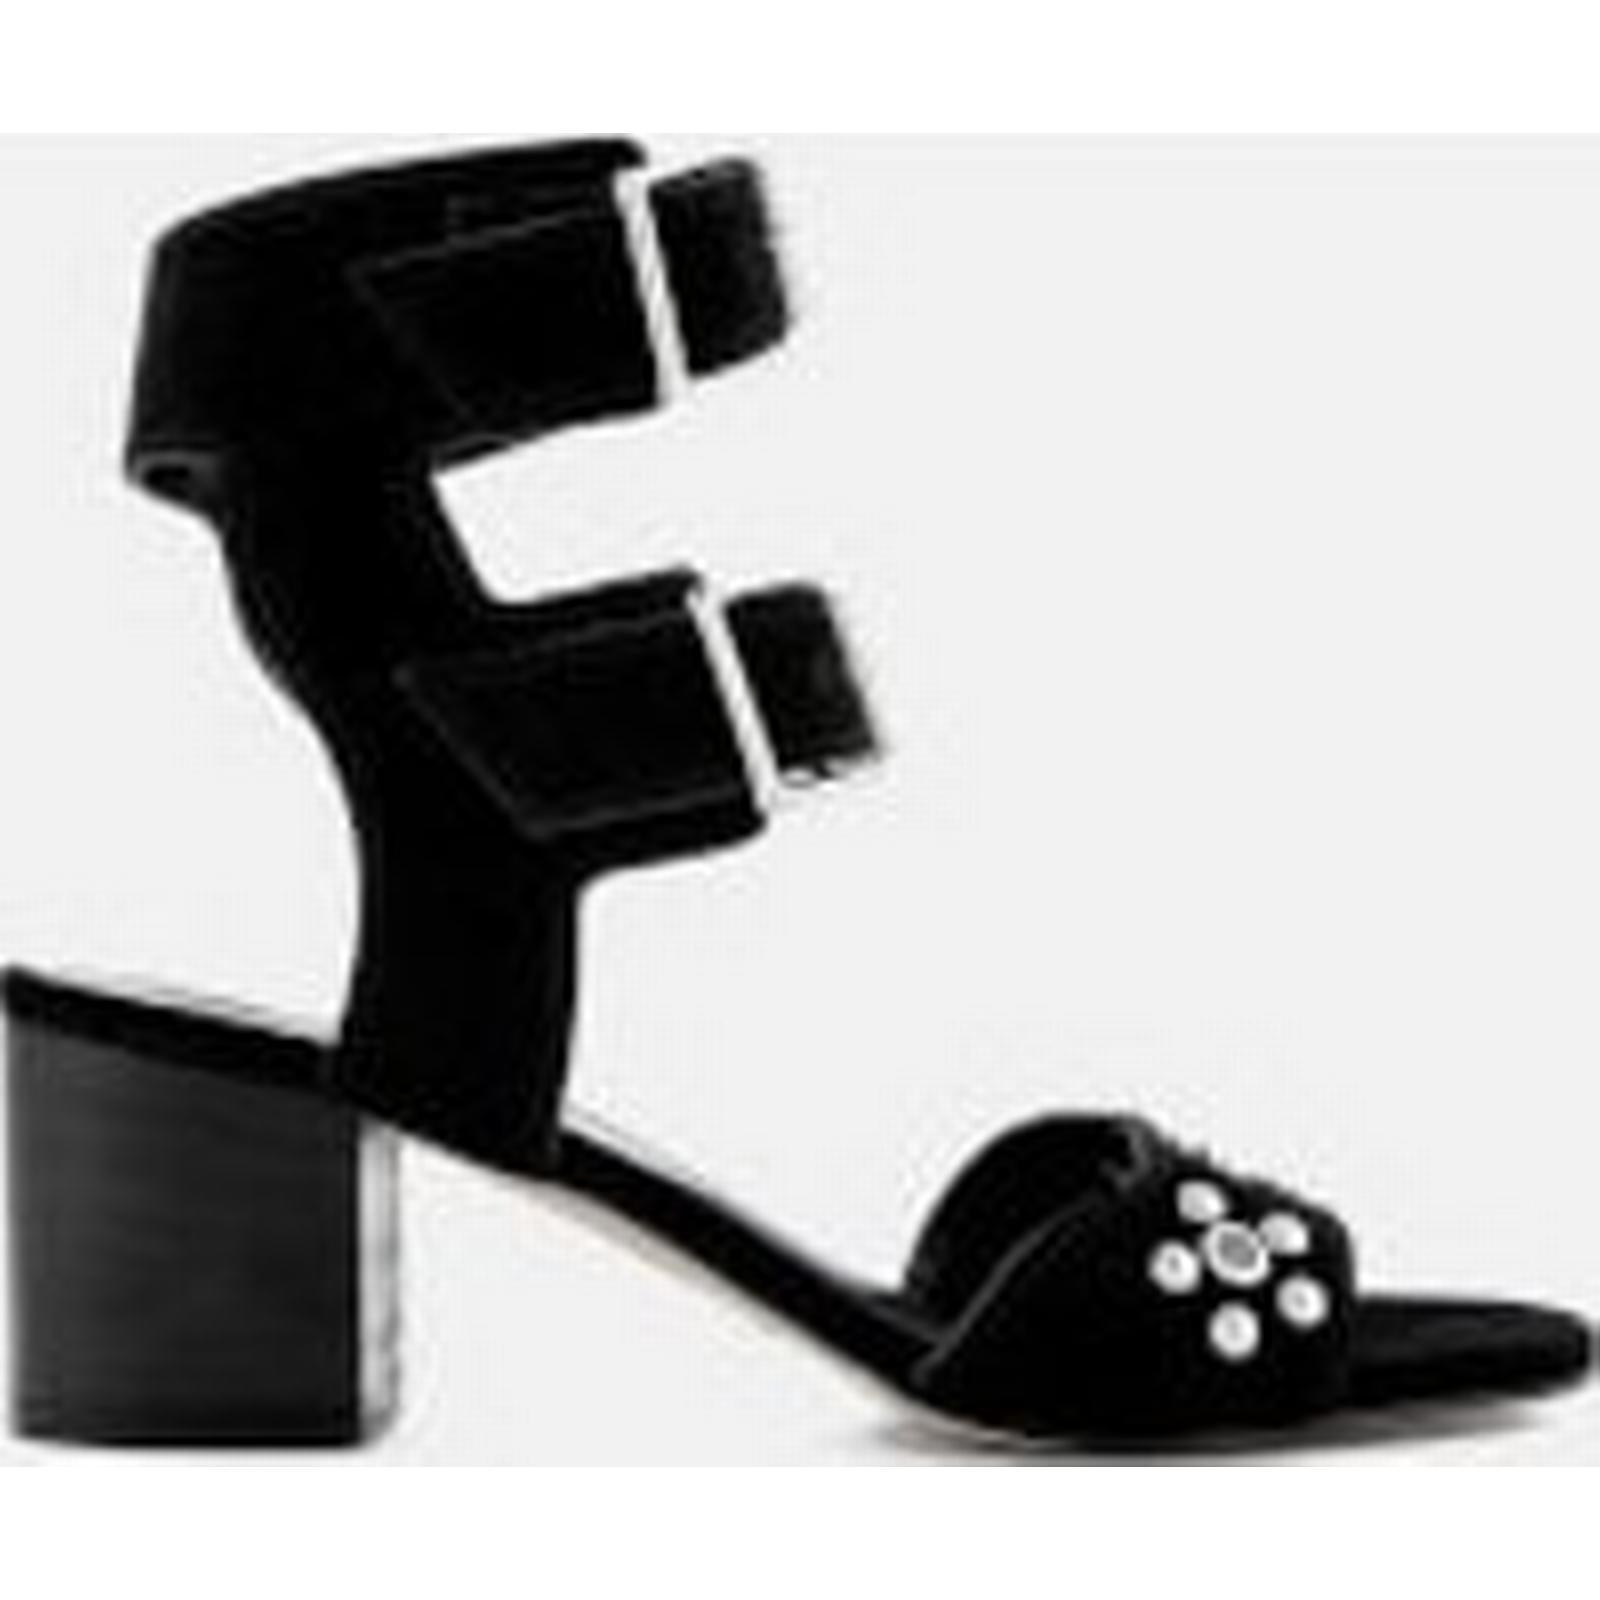 Rebecca Minkoff Women's Sofia Suede Heeled Sandals - Black Black - UK 4 - Black Black b28c5c